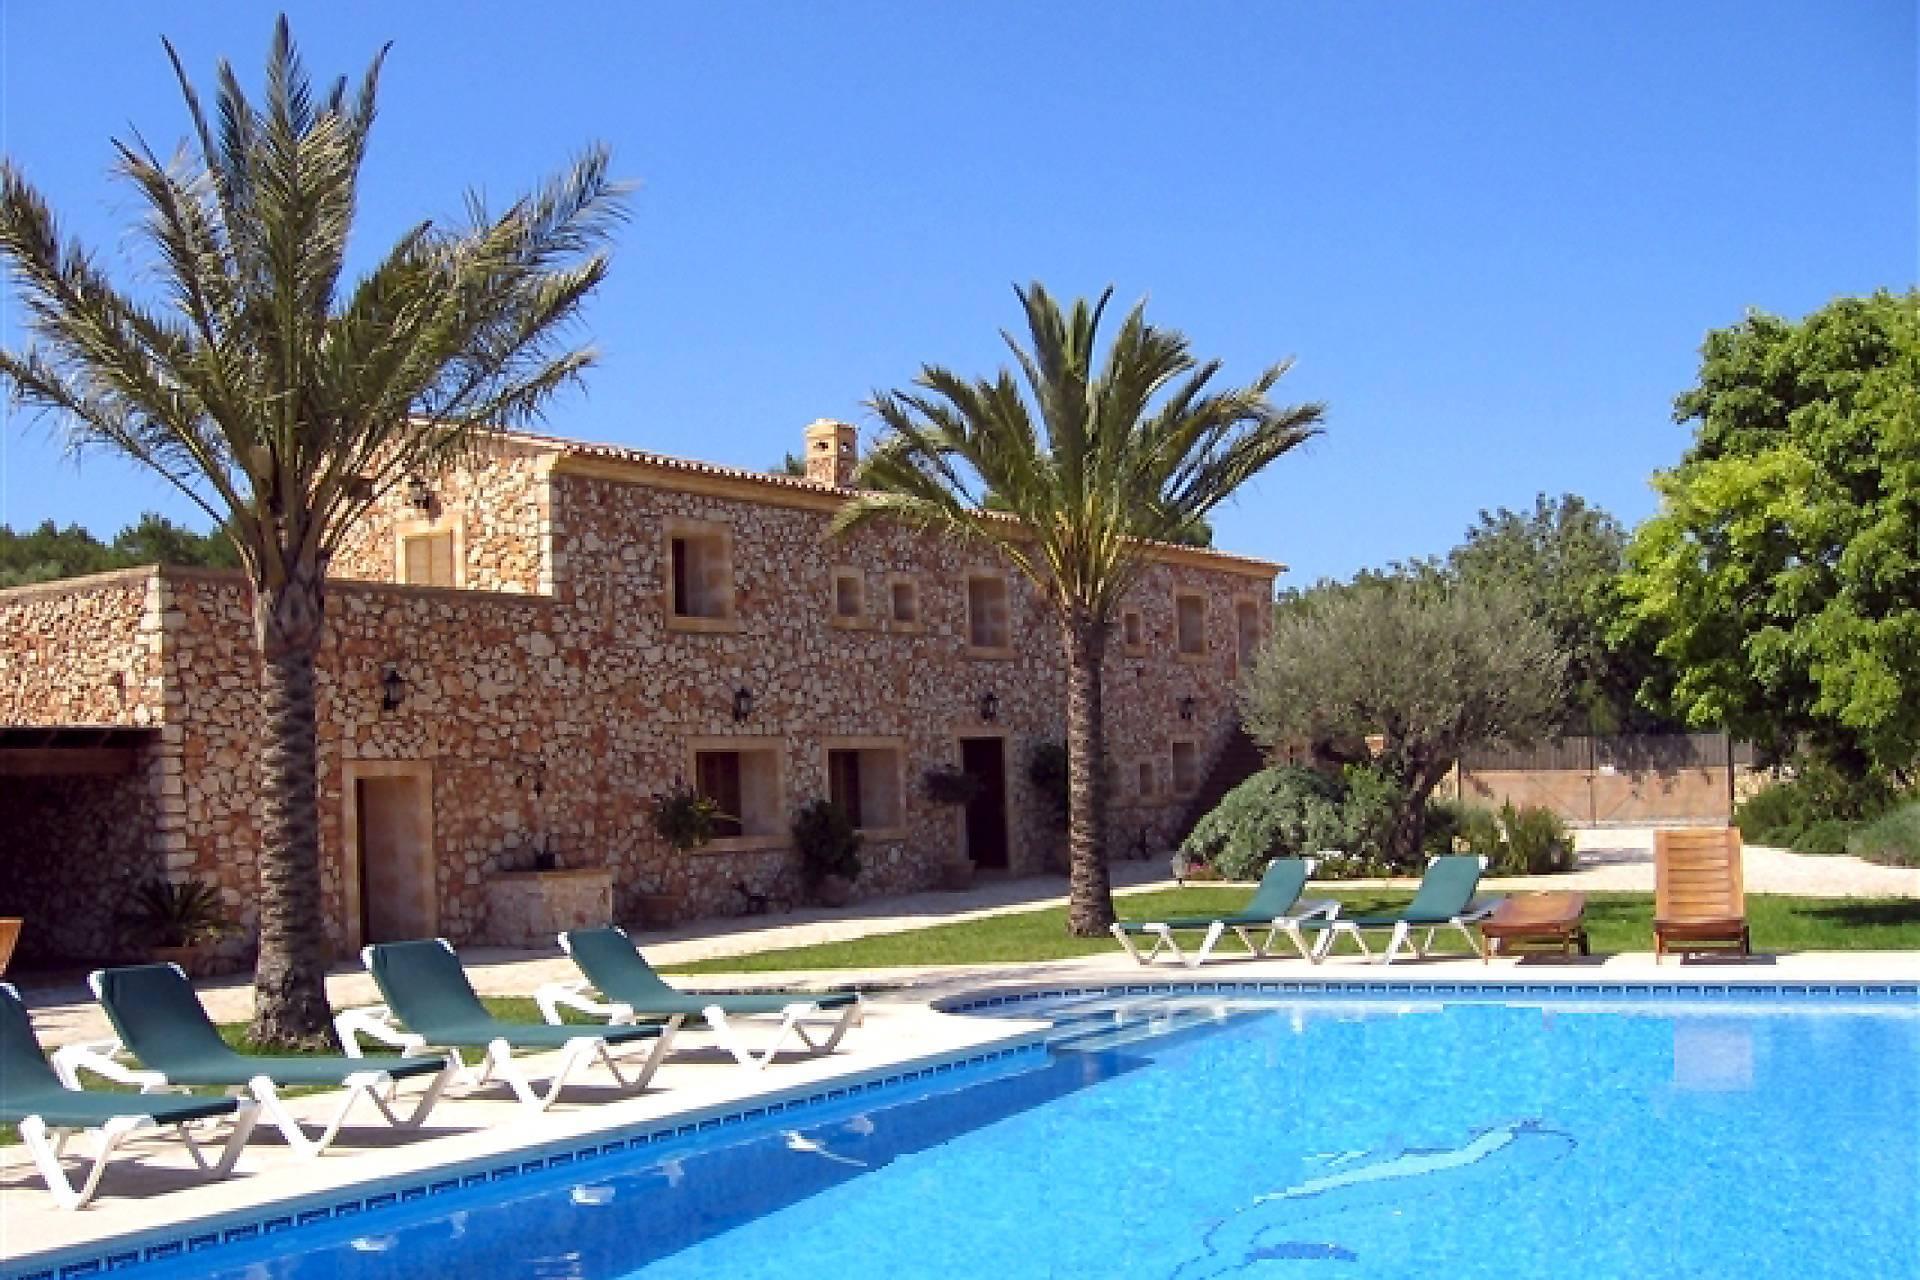 01-66 Rustikale Finca Mallorca Osten Bild 5